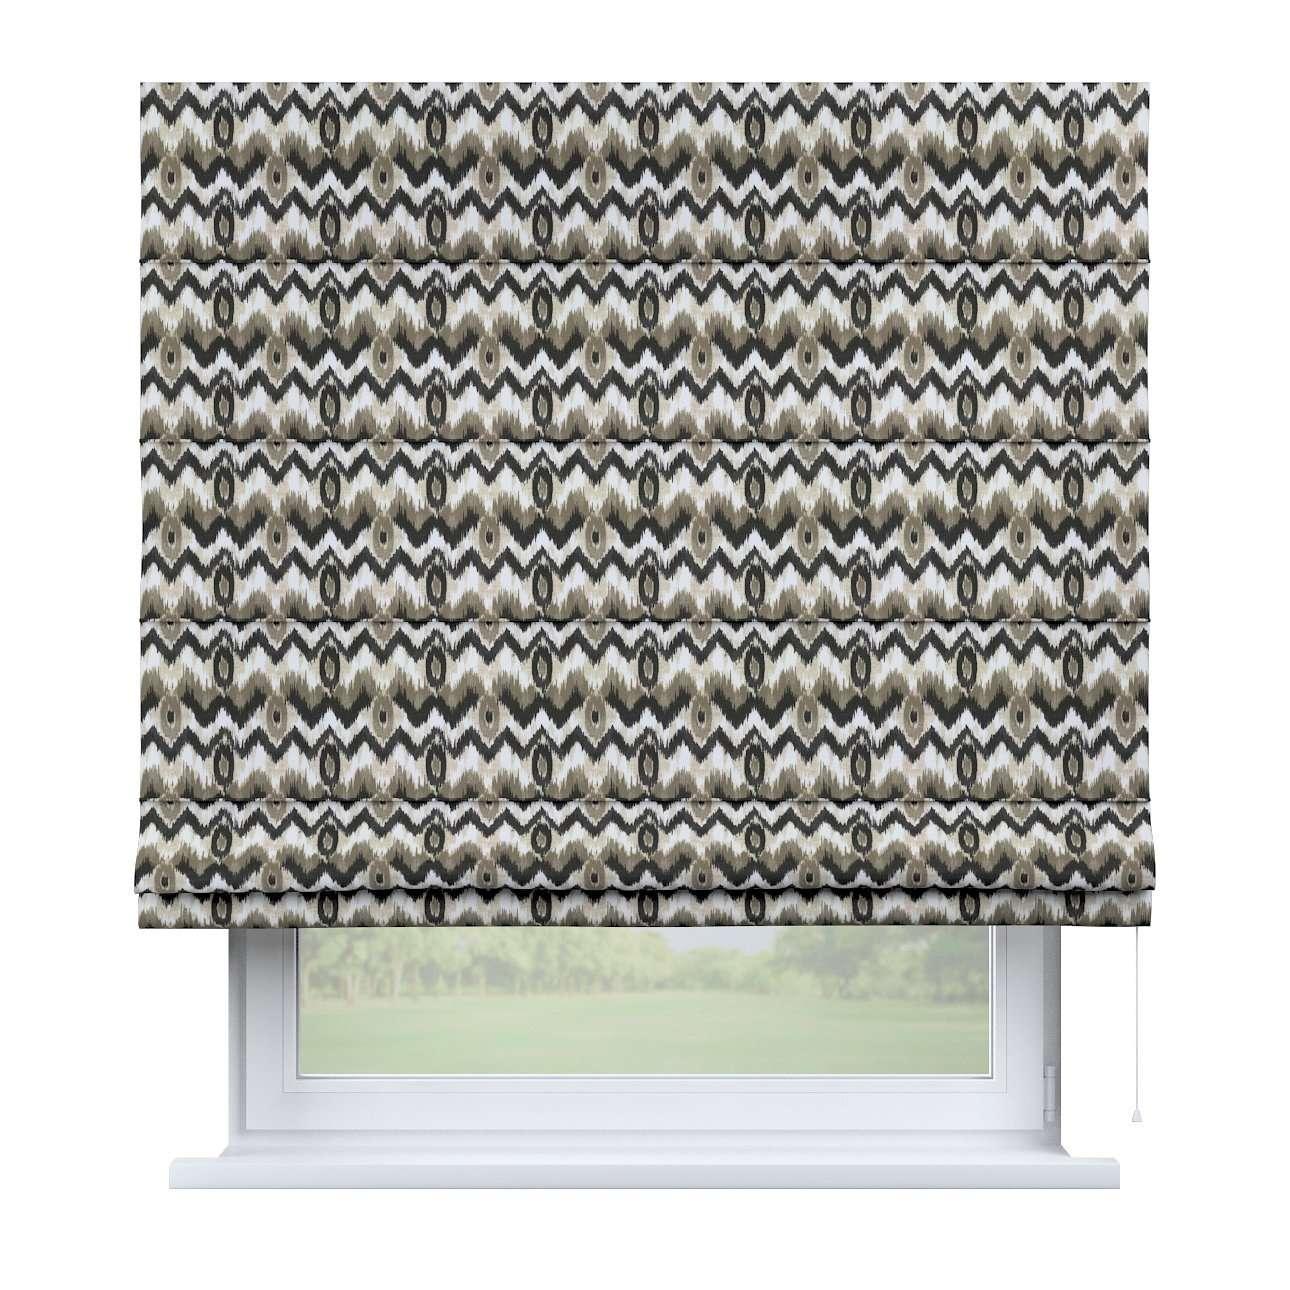 Capri roman blind in collection Modern, fabric: 141-88